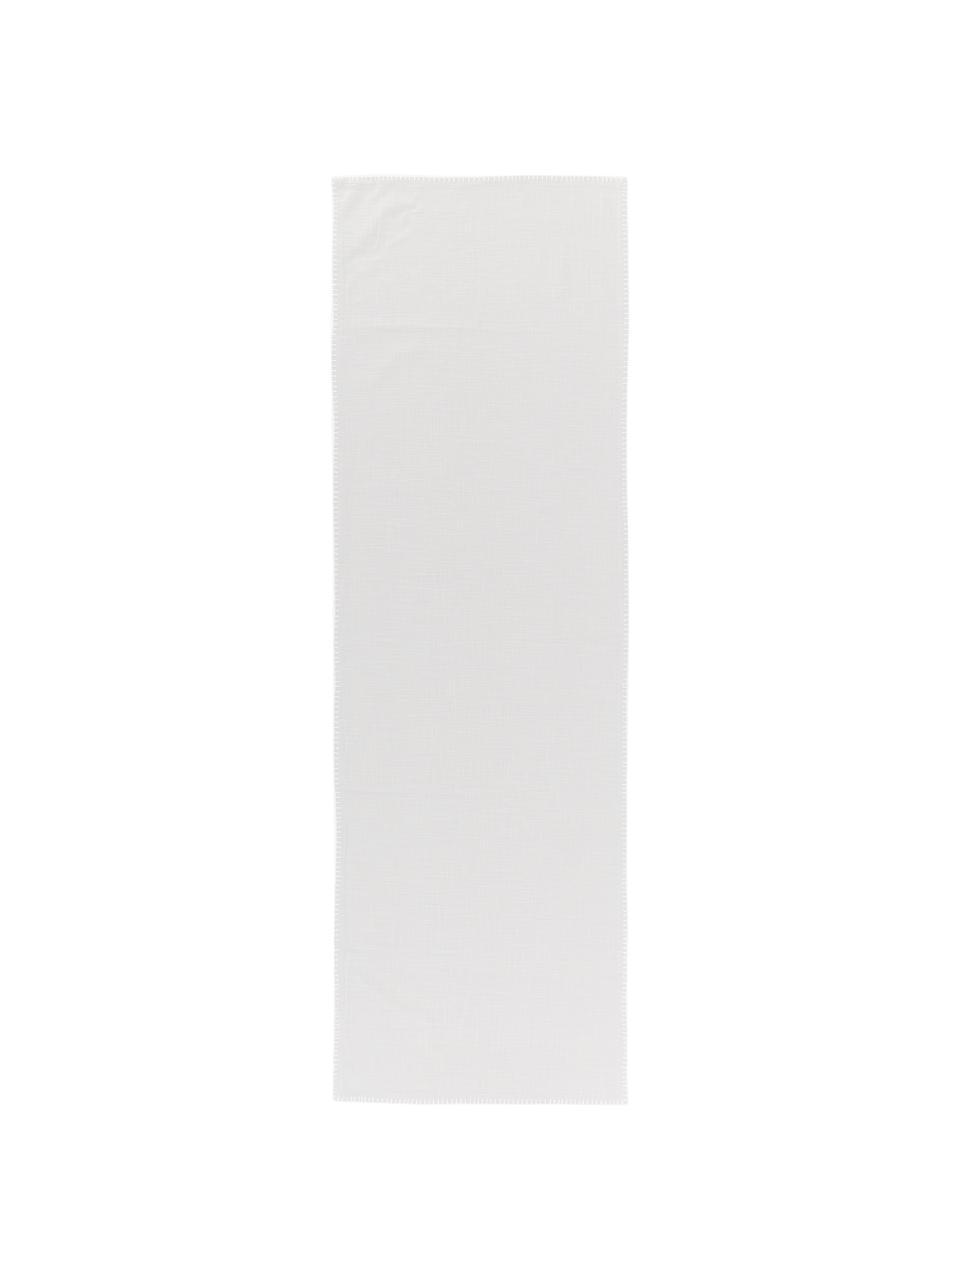 Baumwoll-Tischläufer Finca in Grau, Baumwolle, Grau, 50 x 160 cm